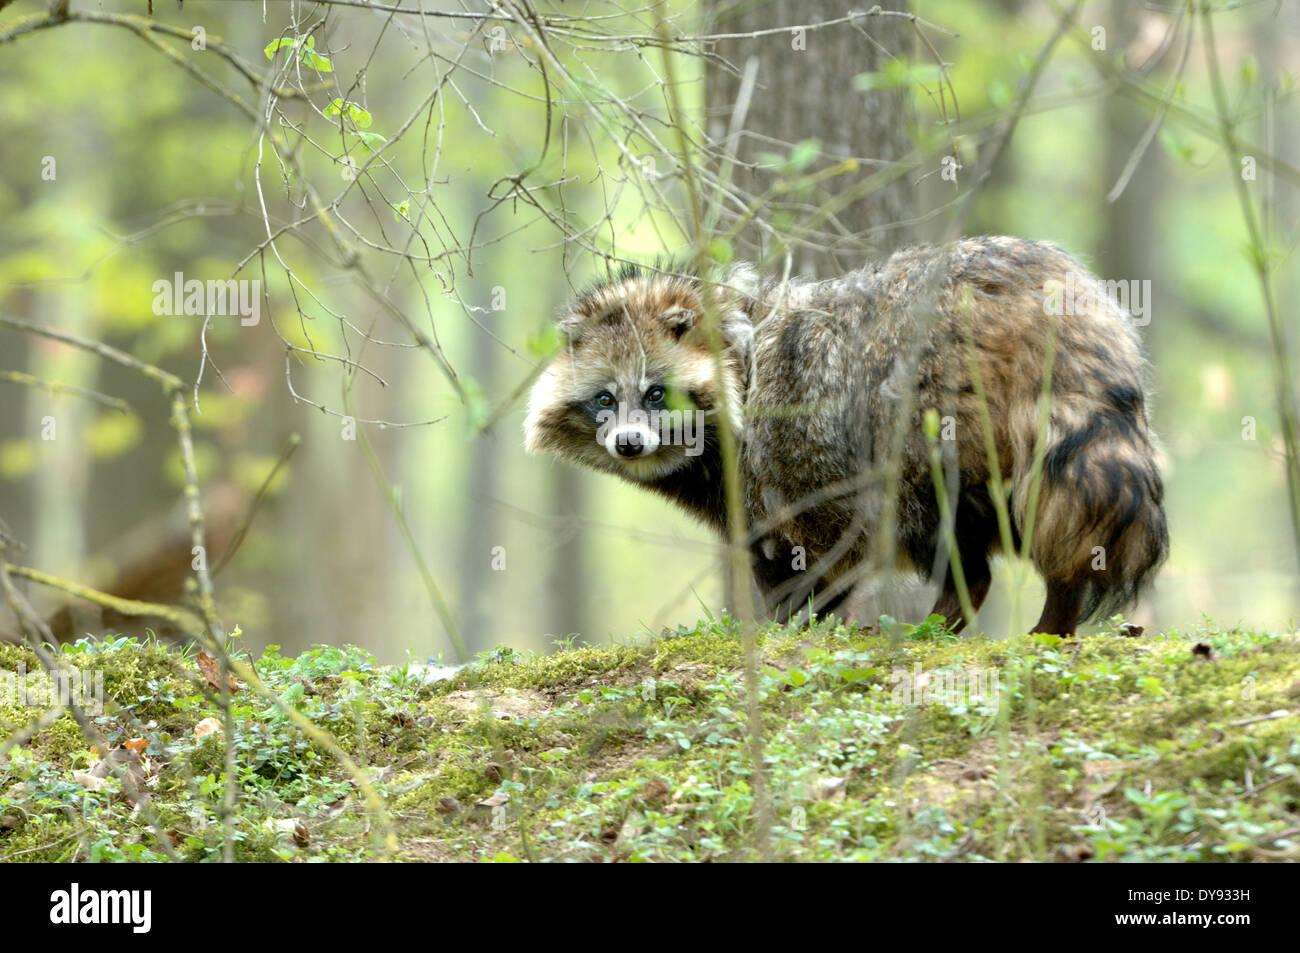 raccoon dog Enok Nyctereutes procyonoides canids predators spring Immigrated wild animals invasive fur fur animal run away live - Stock Image